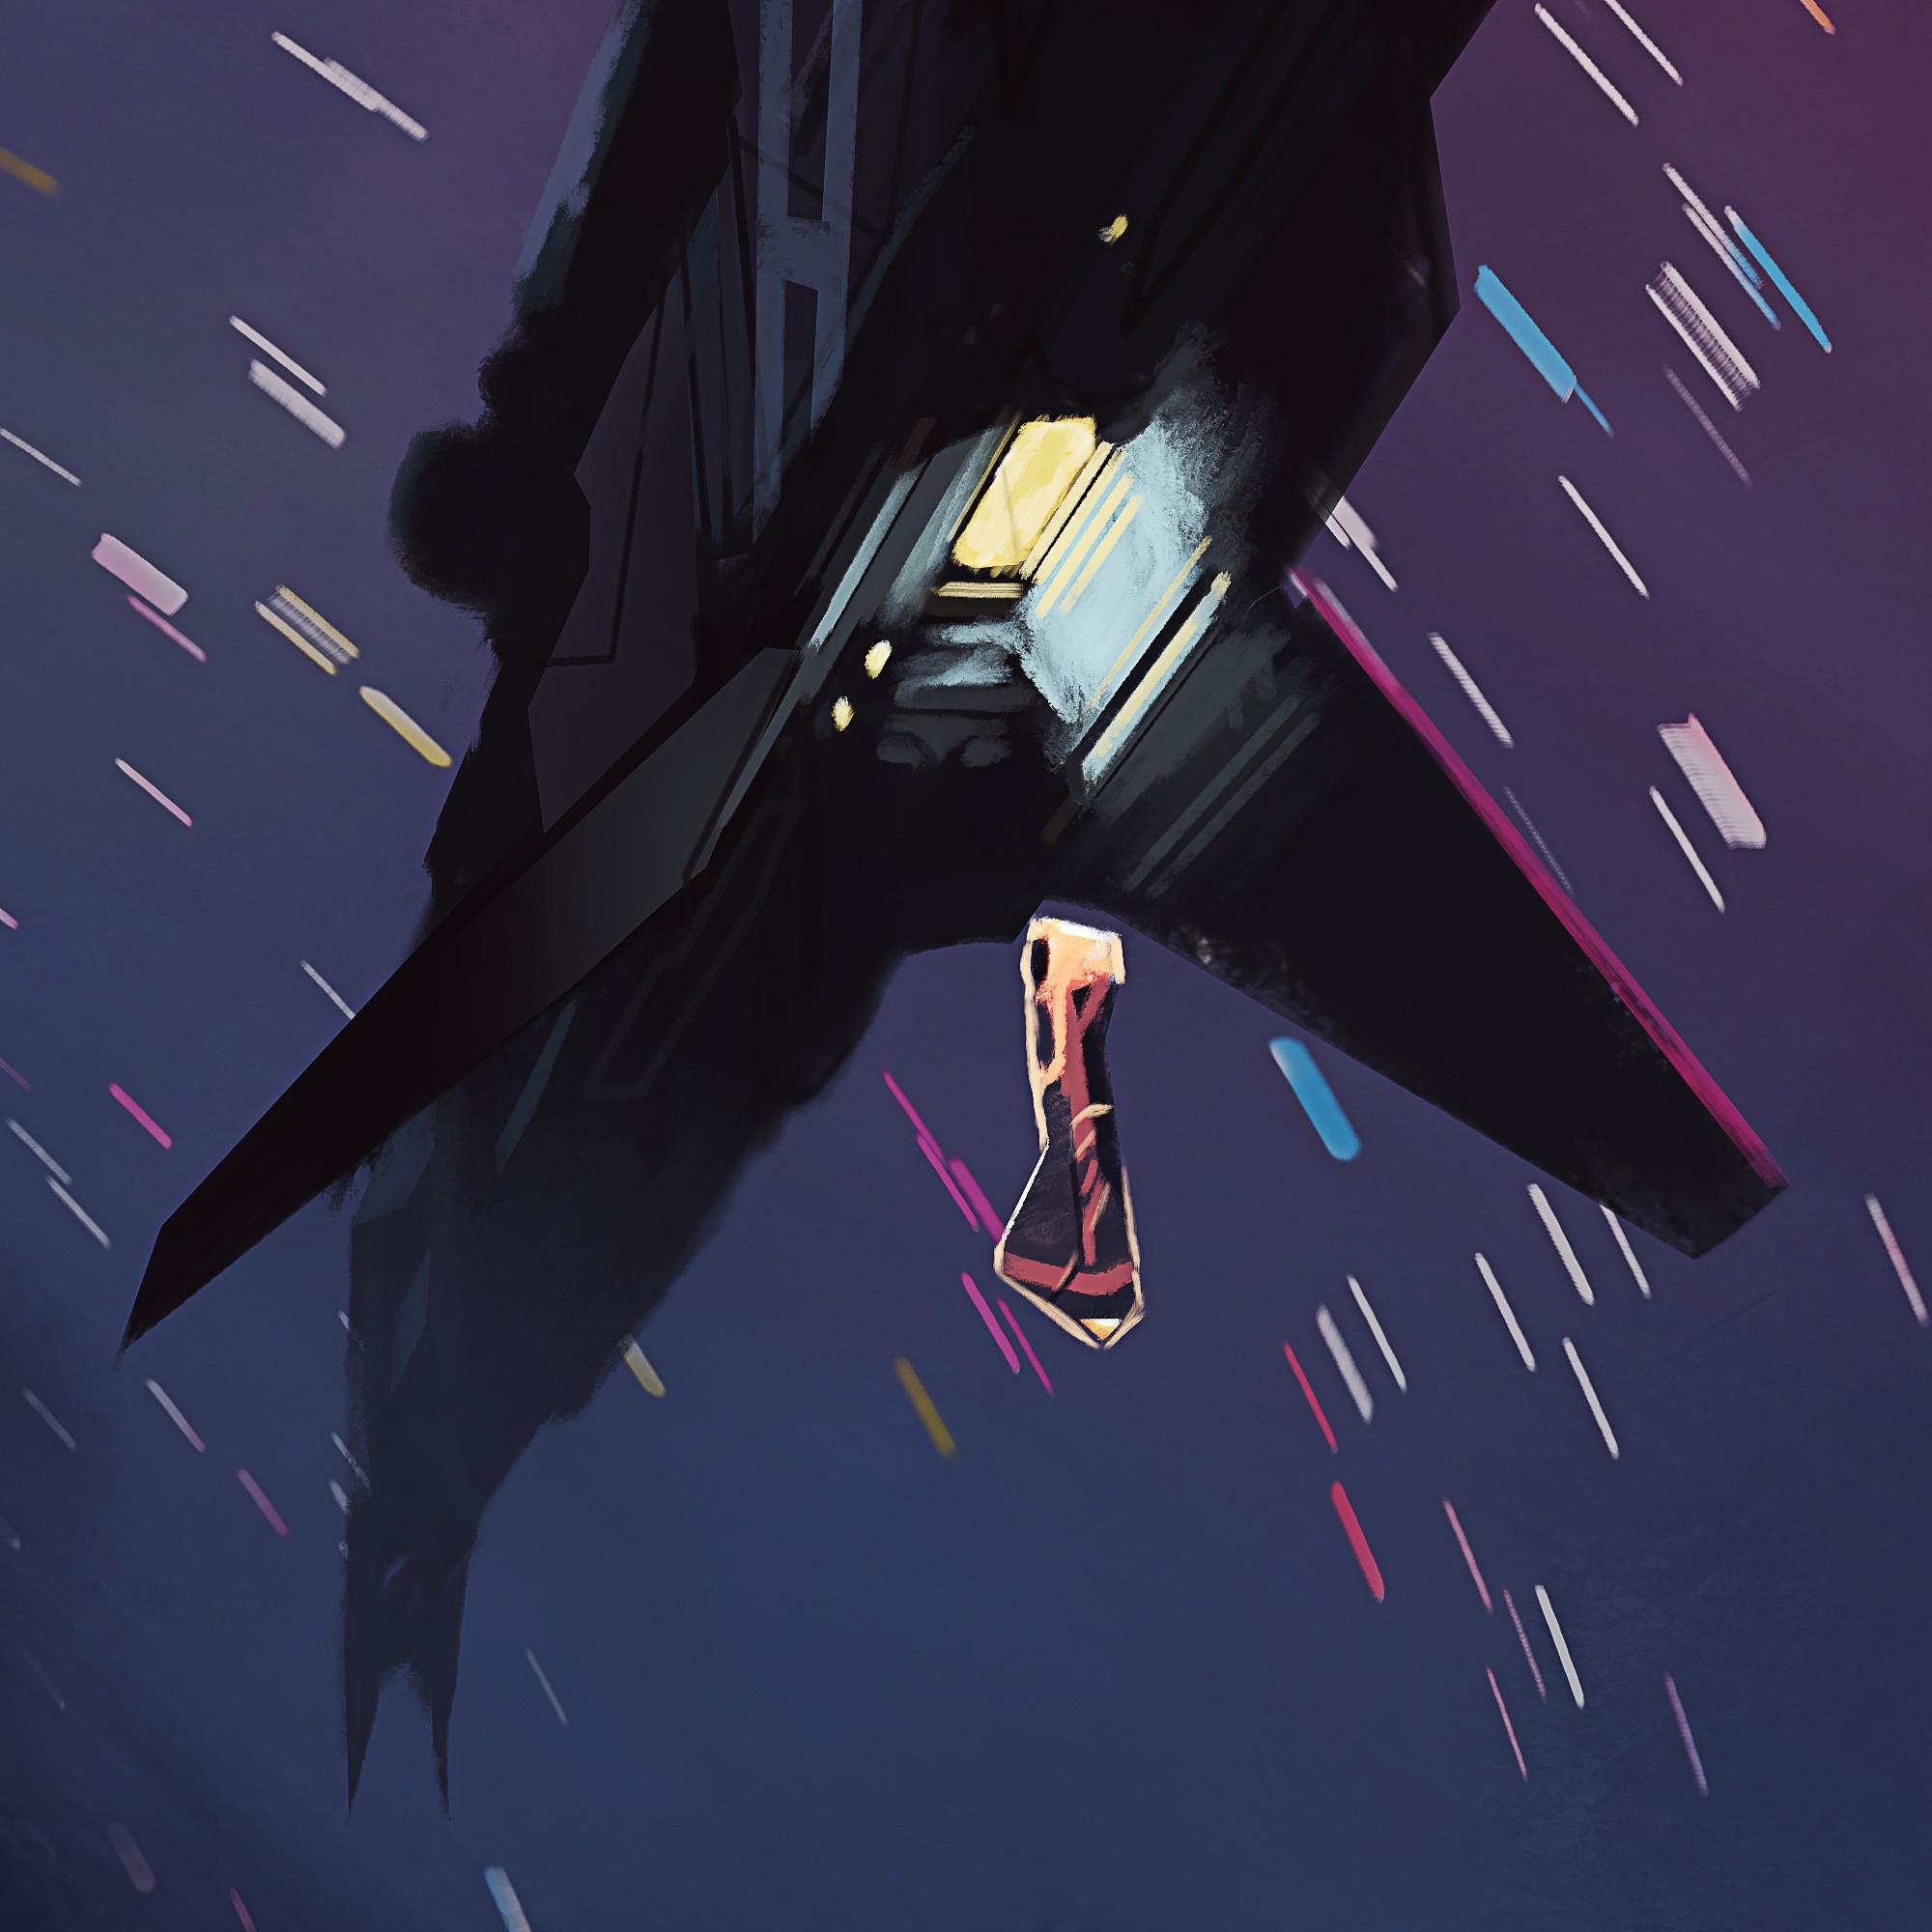 Deep Space (detail)